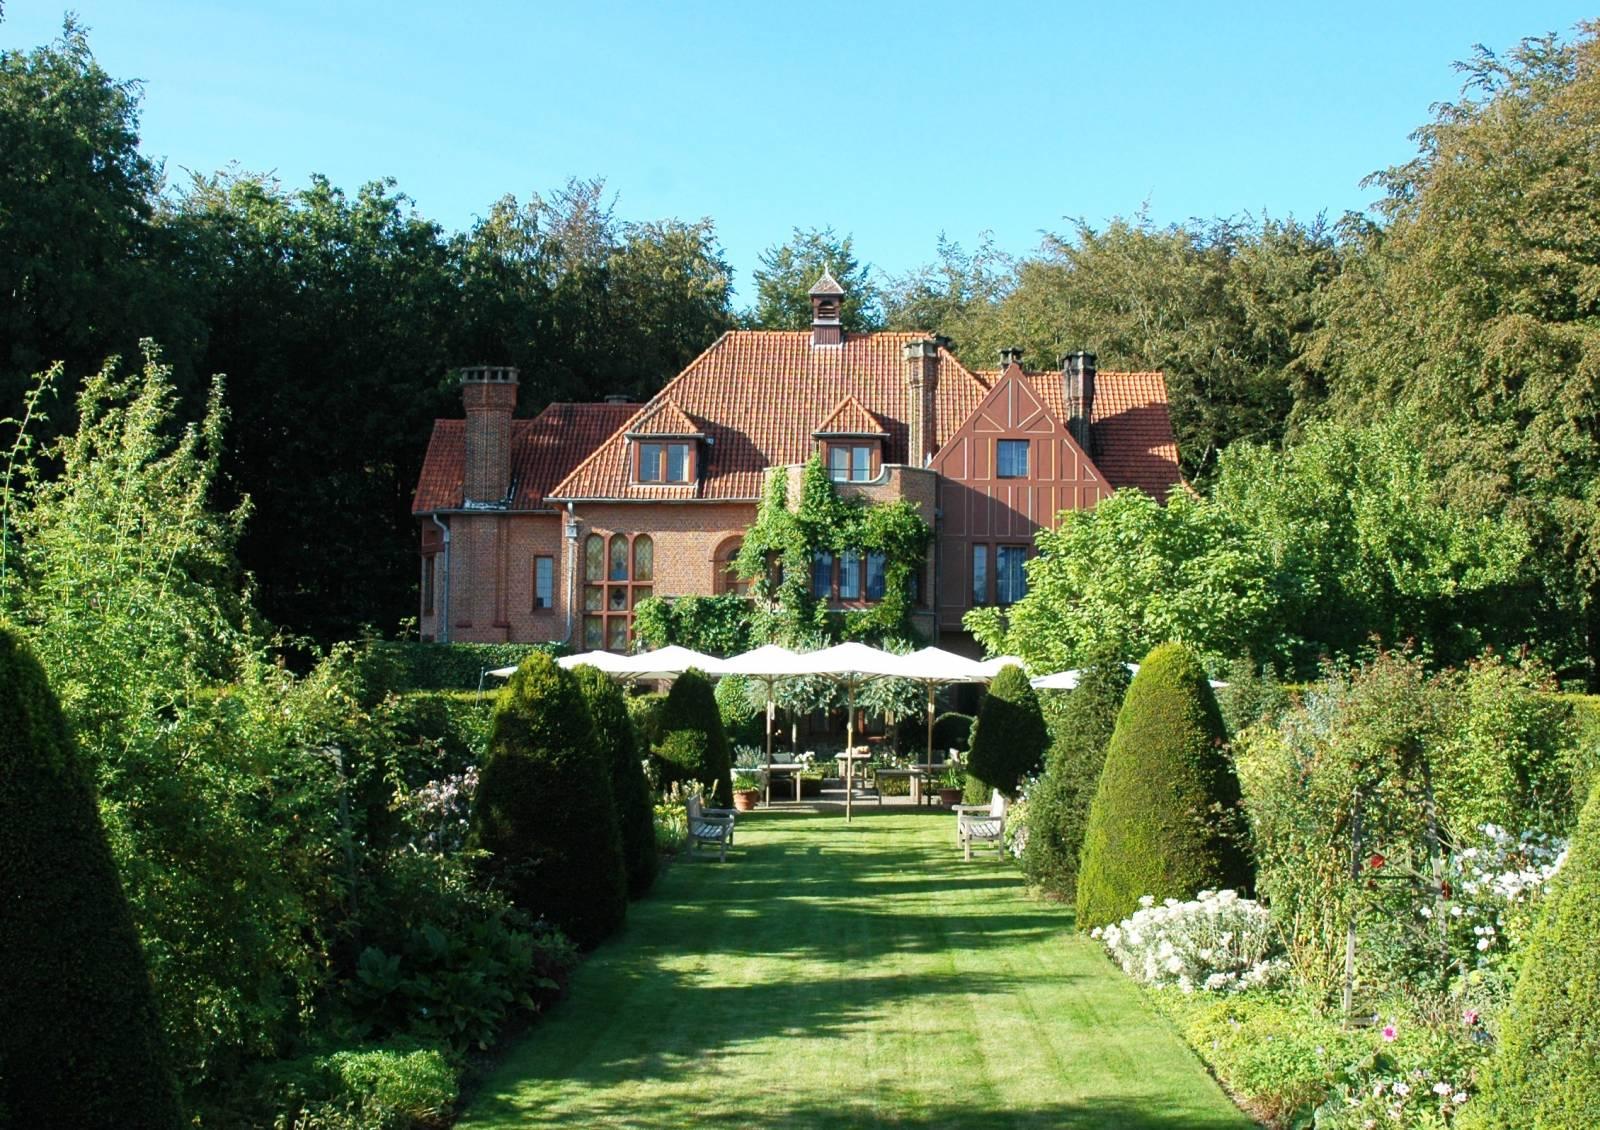 Louise Marie Manor Gardens - Feestzaal - House Of Weddings - 40